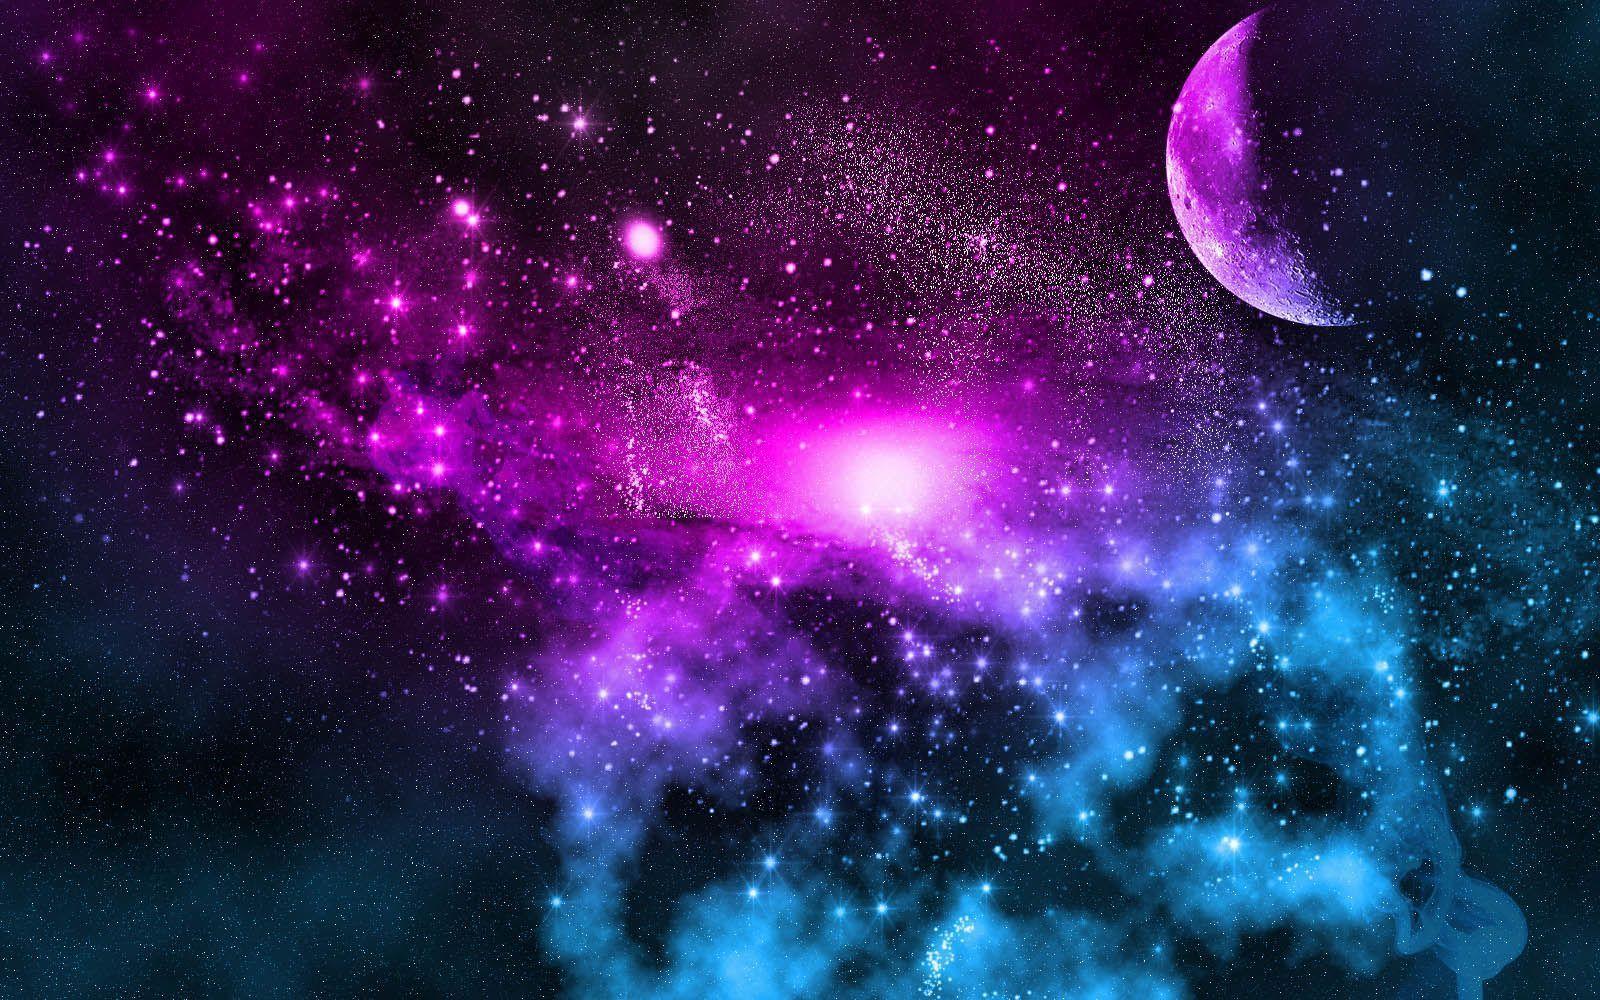 Bunte Galaxie Wallpaper Galaxy Wallpaper Galaxy Hd Galaxy Art